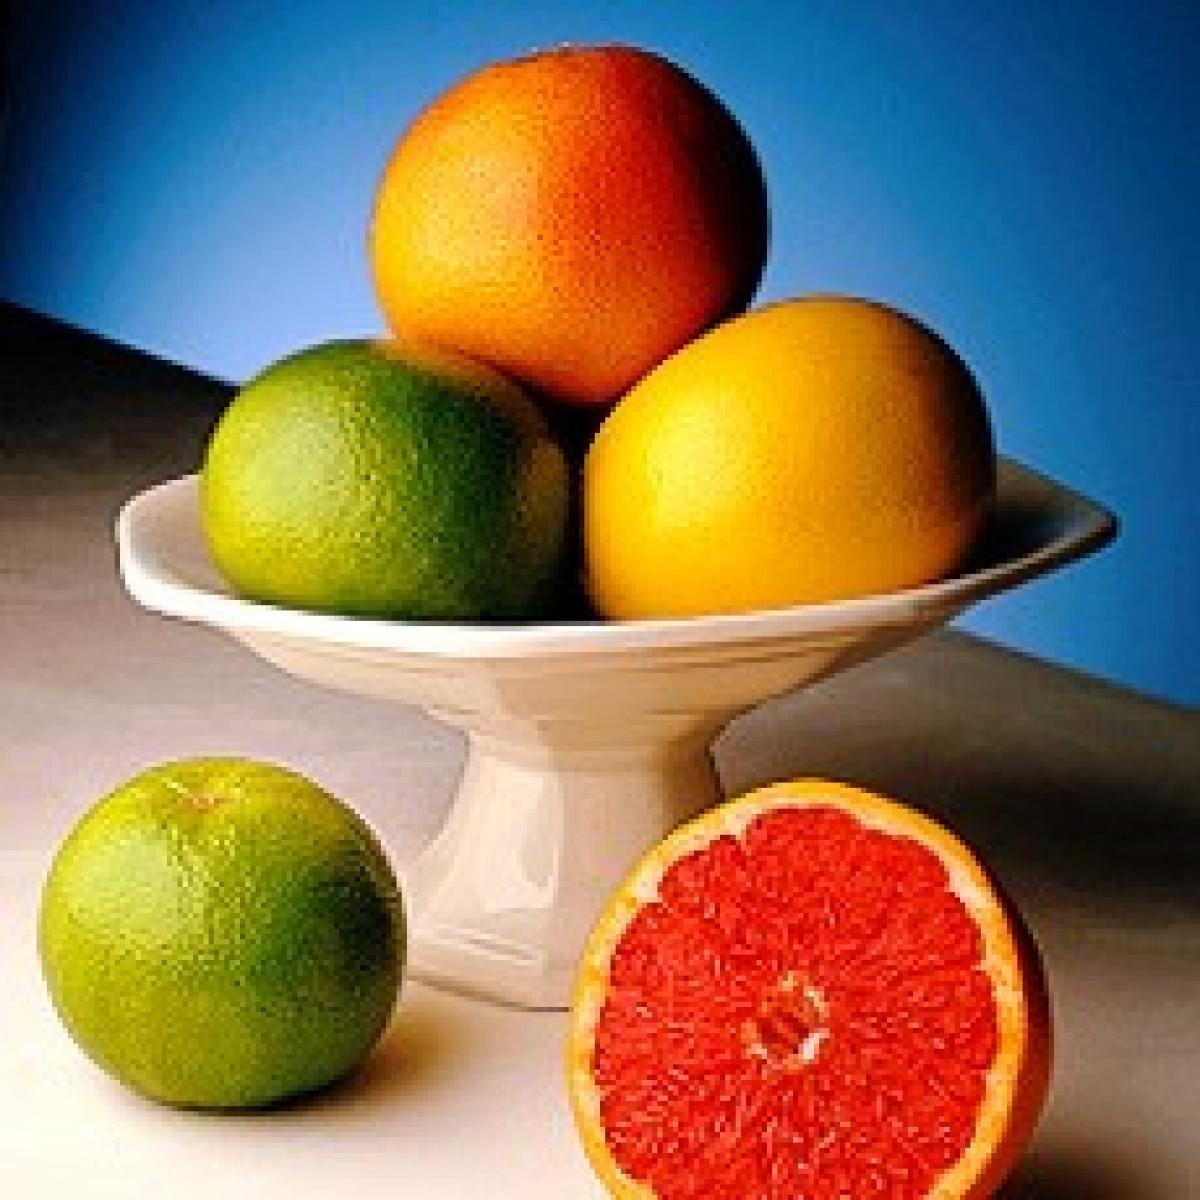 Grapefruit 19475